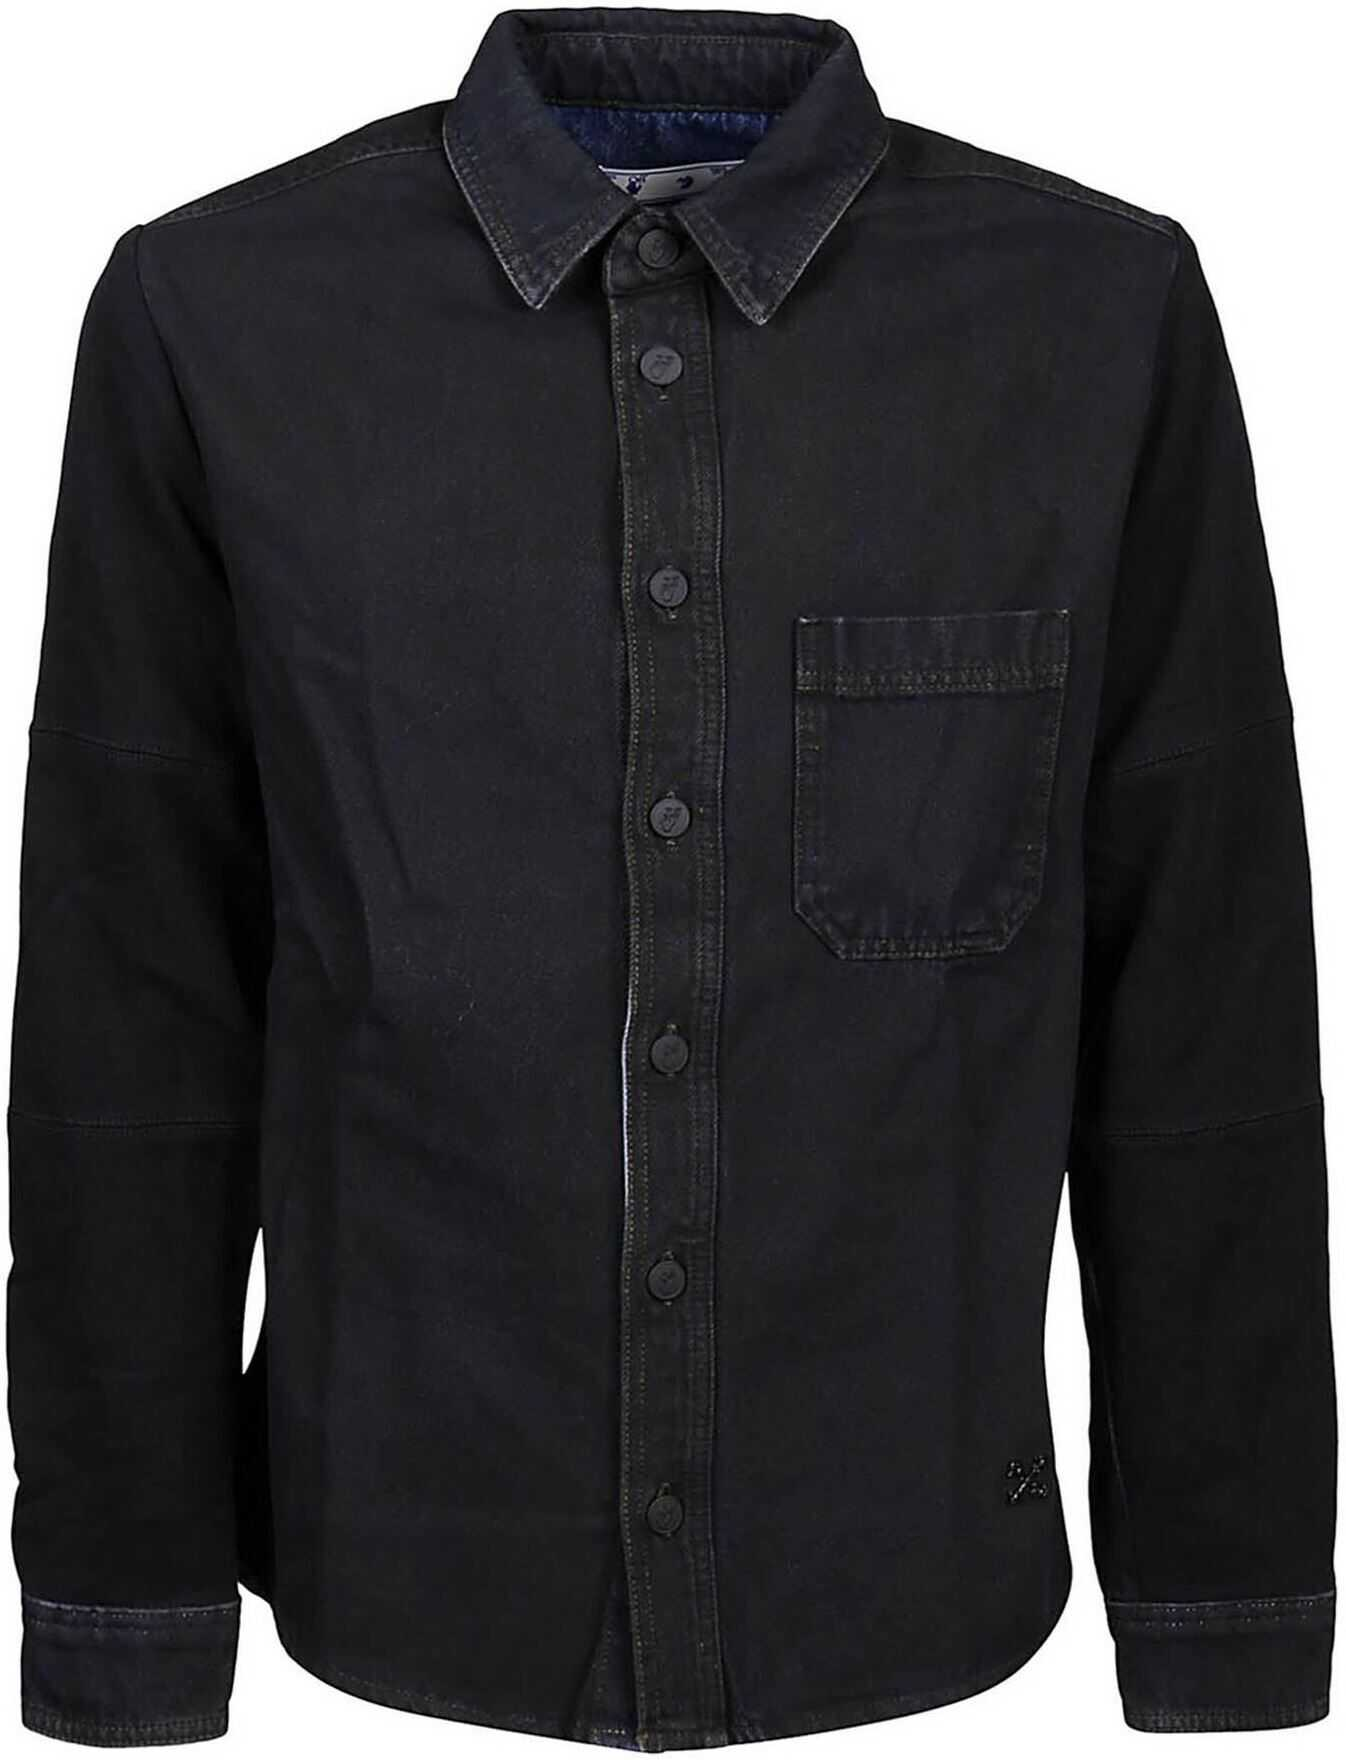 Off-White Denim Shirt In Black Black imagine